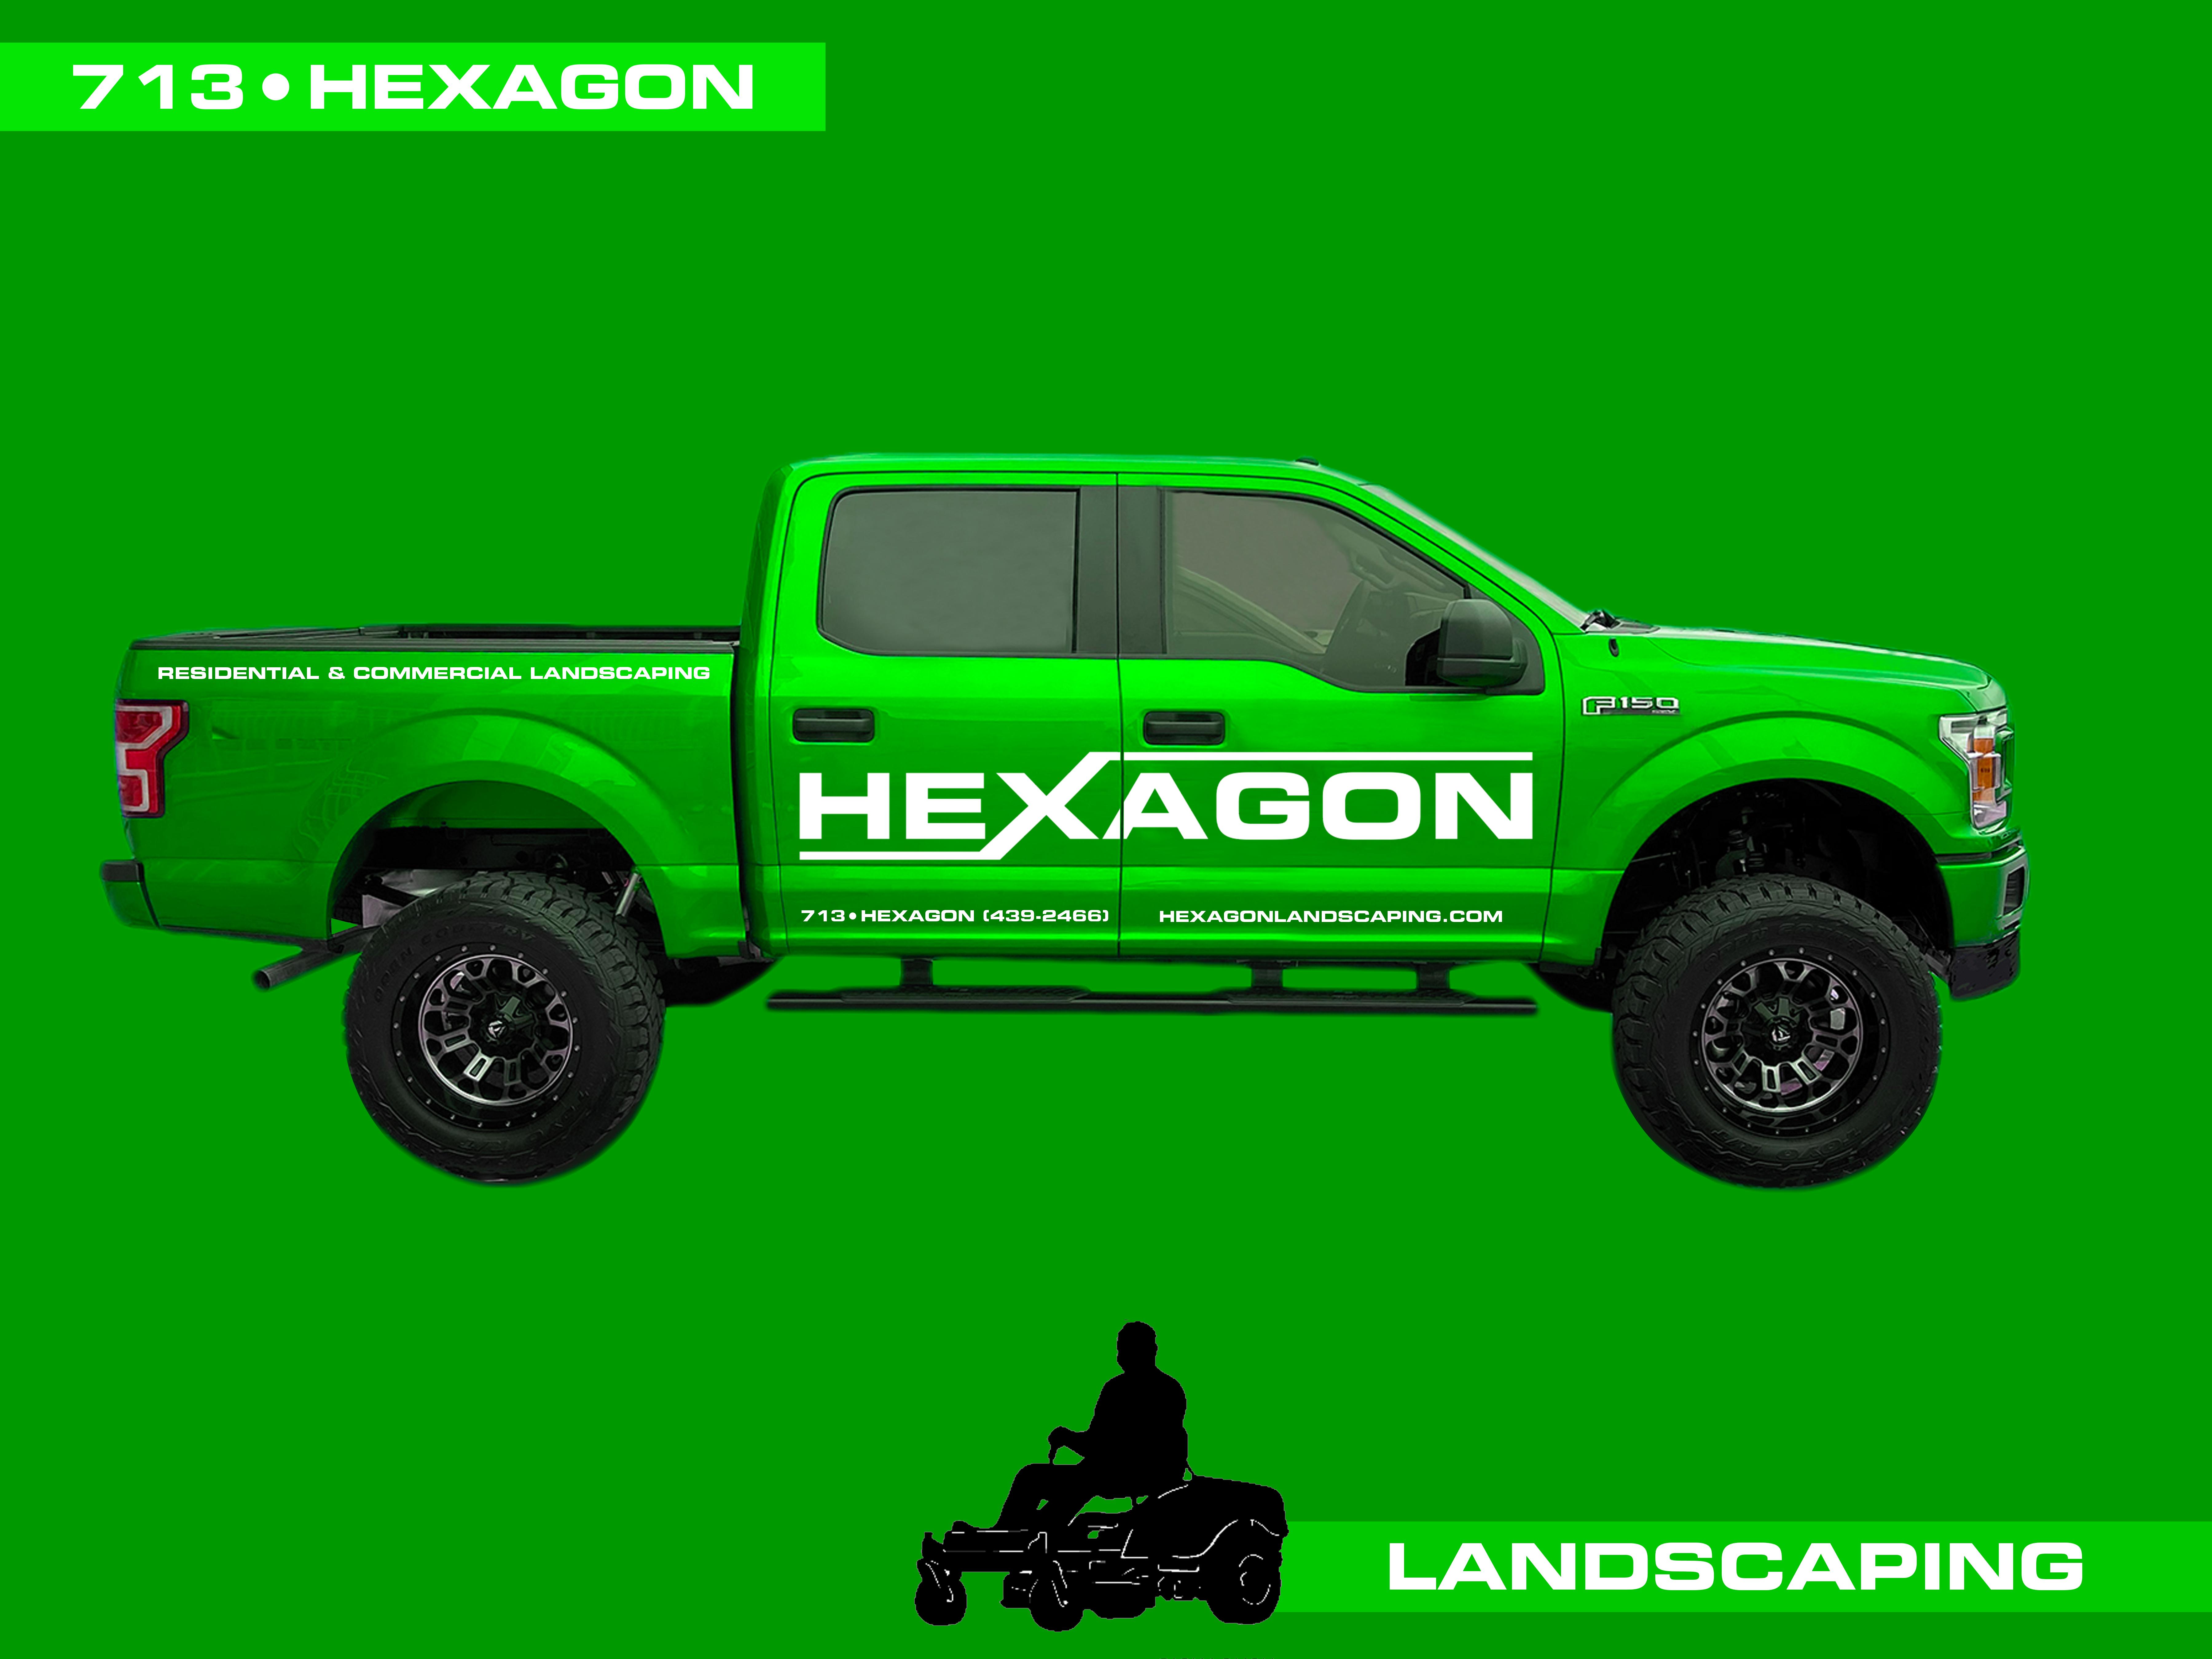 Hexagon Landscaping LLC